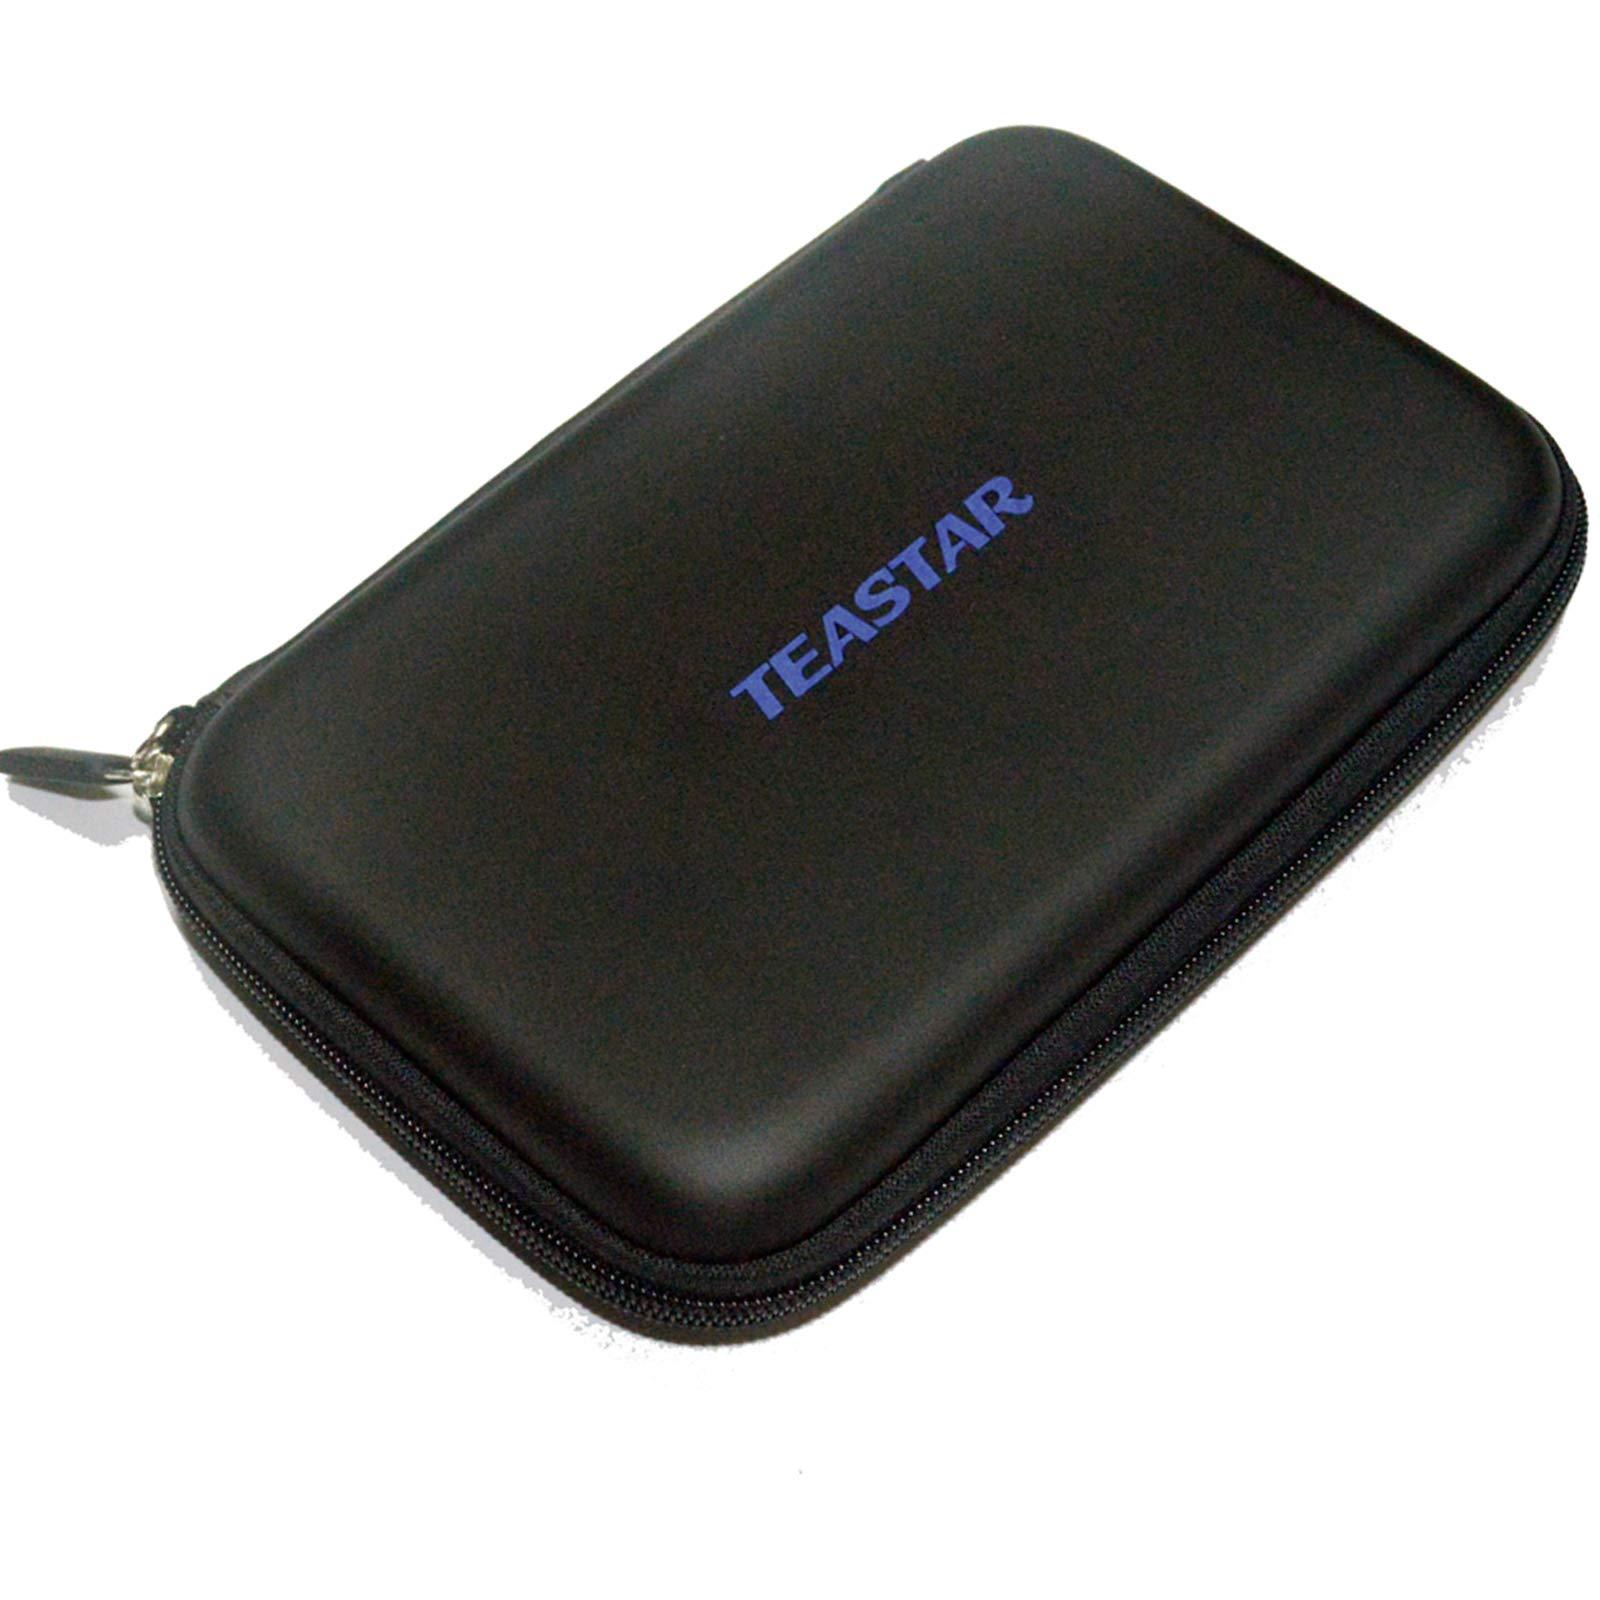 TEASTAR 7'' Inch Hard Carrying Travel GPS Case Zipper Bag Pouch Cover GPS Protective for 6'' - 7'' GPS Navigation Garmin Nuvi 65LMT 2797lmt 2798LMT 2757LM 2789 Dezl 760lmt Tomtom Magellan Roadmate Black